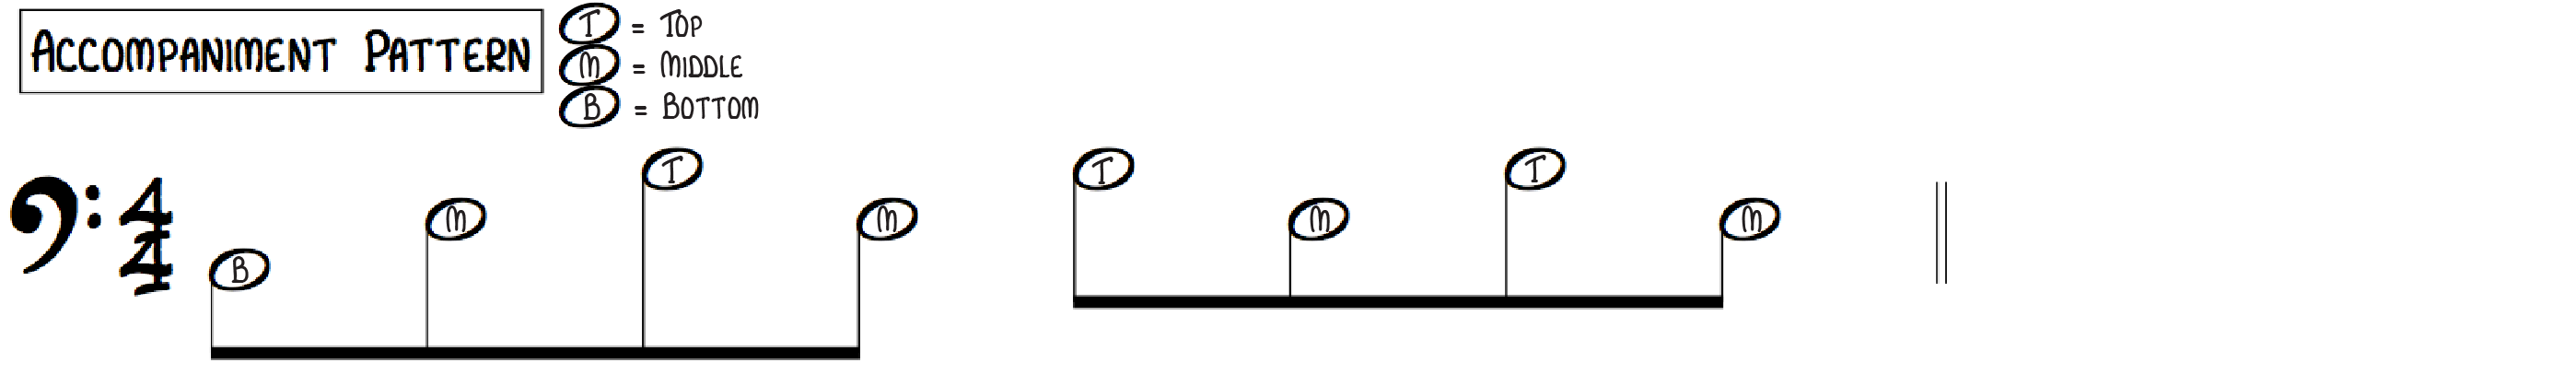 Mystery Progression Left Hand Arpeggio Broken Chord Arranging